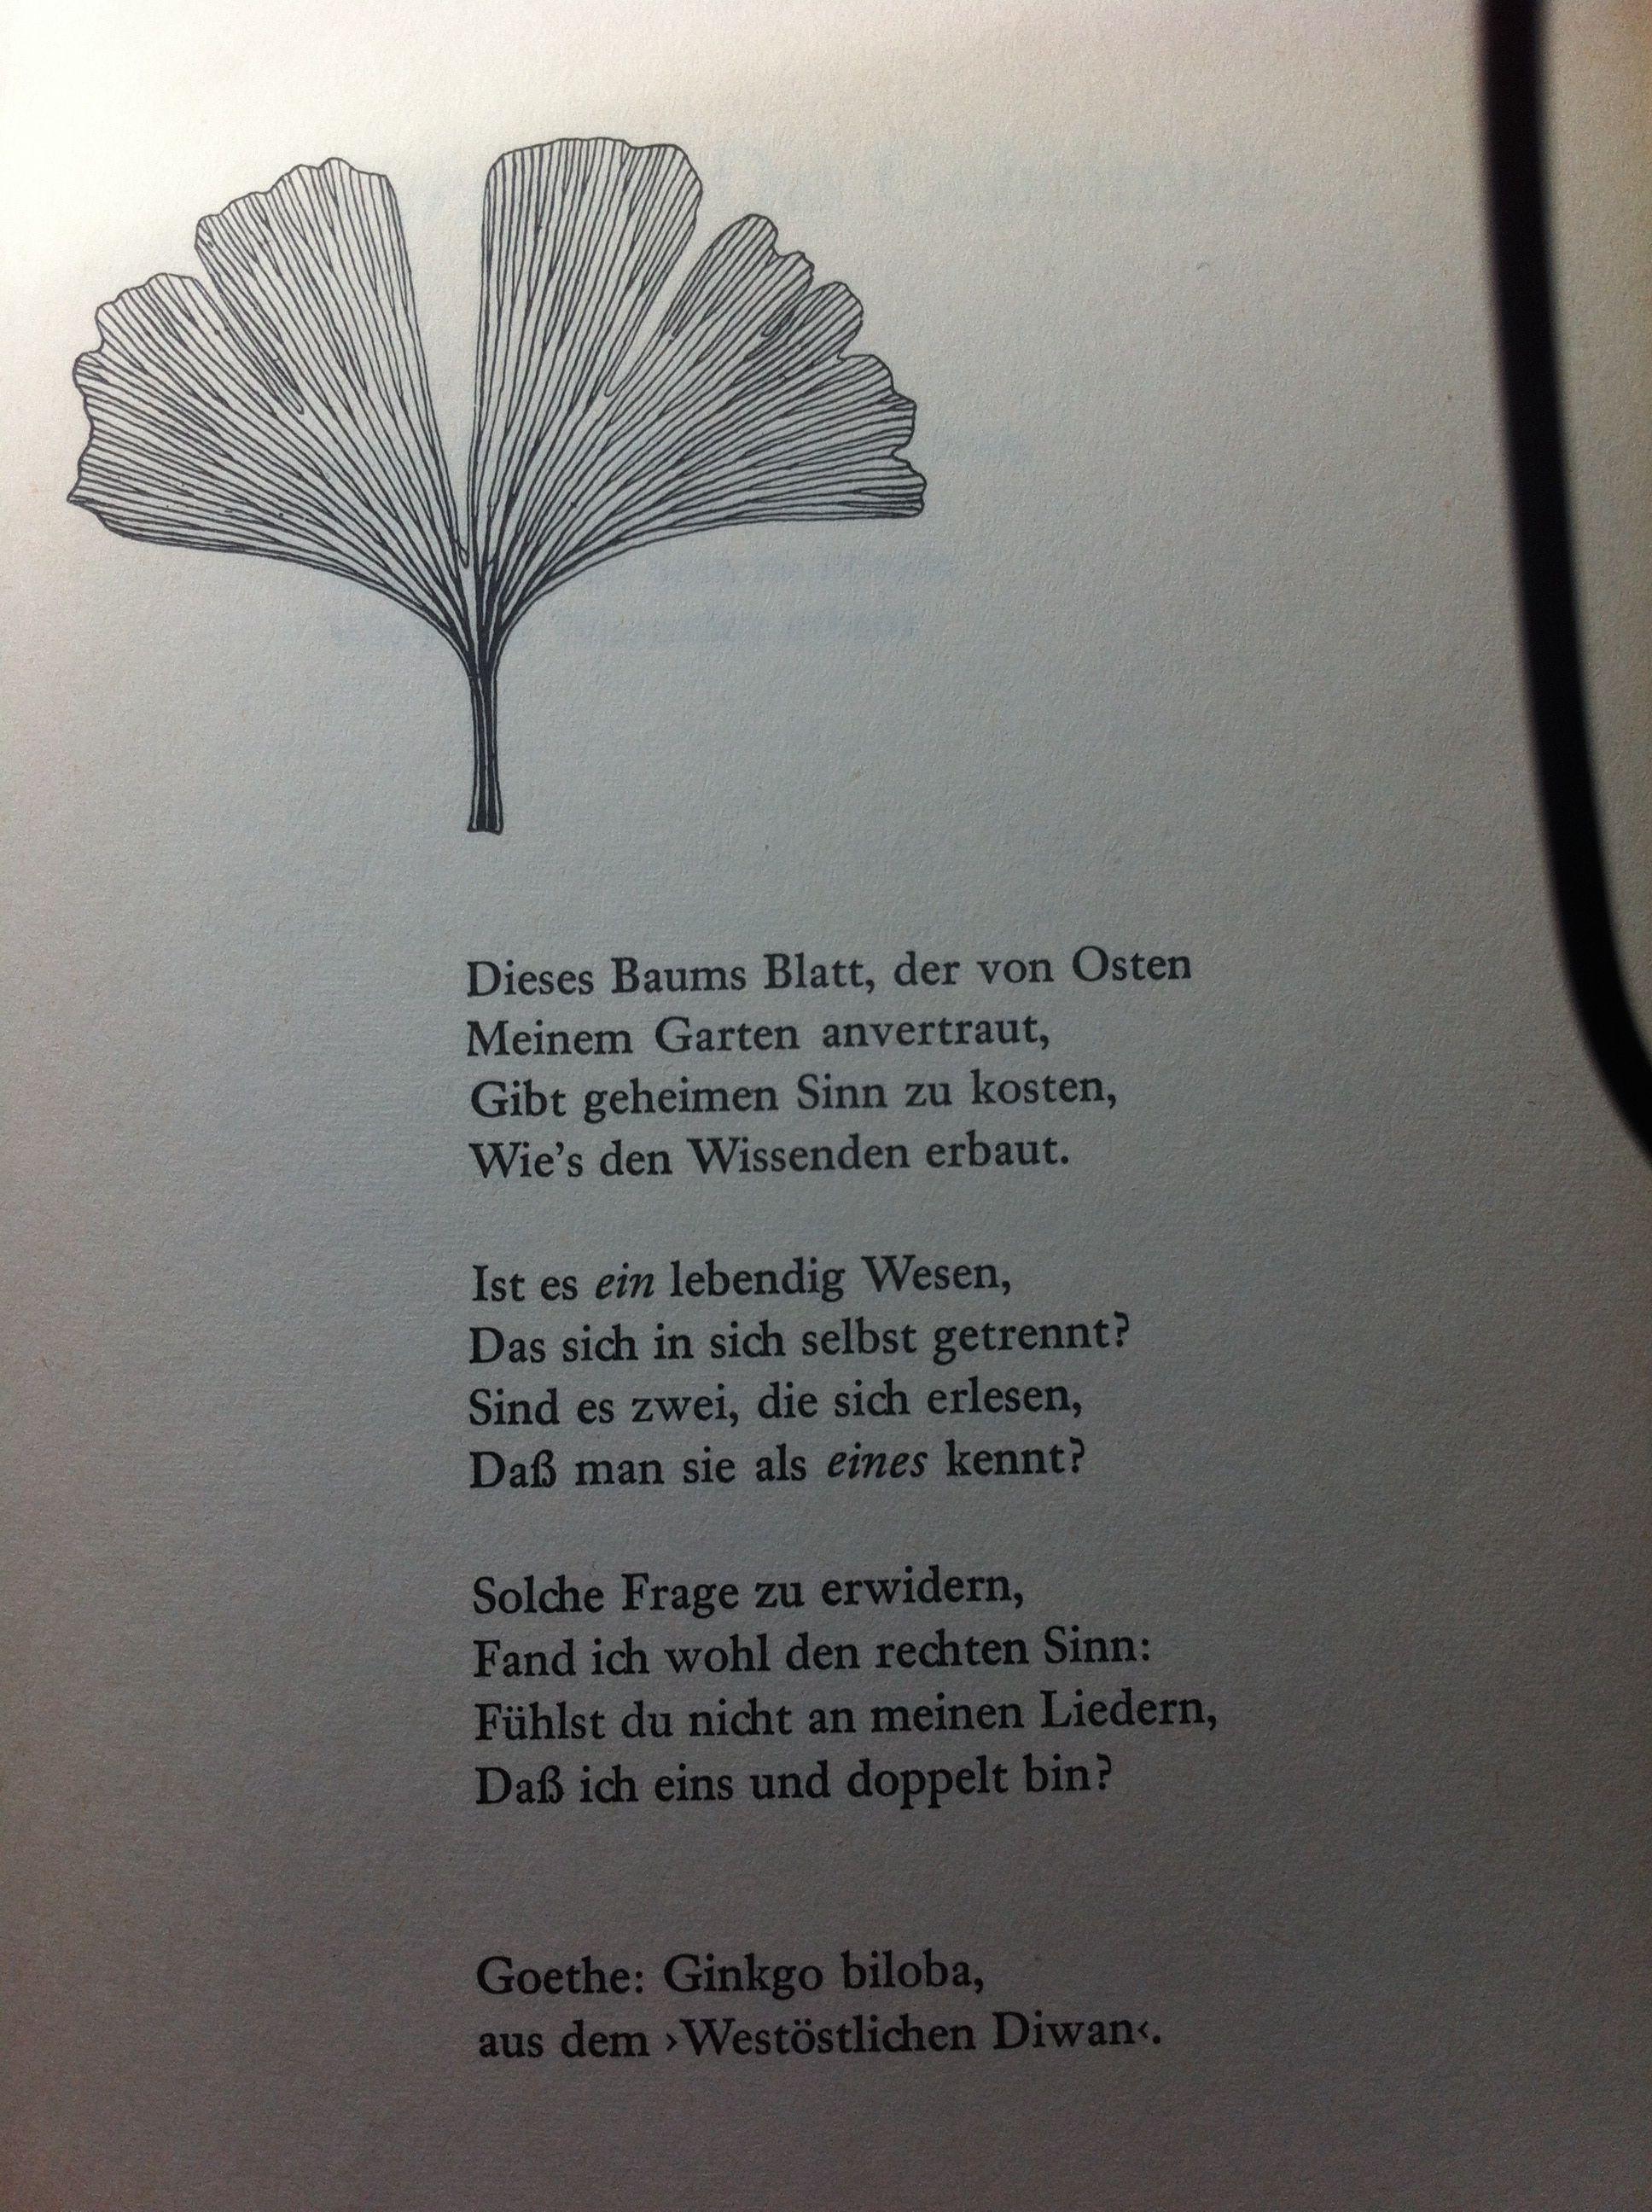 One Of My Favorite Poems Ginkgo Biloba Goethe In 2019